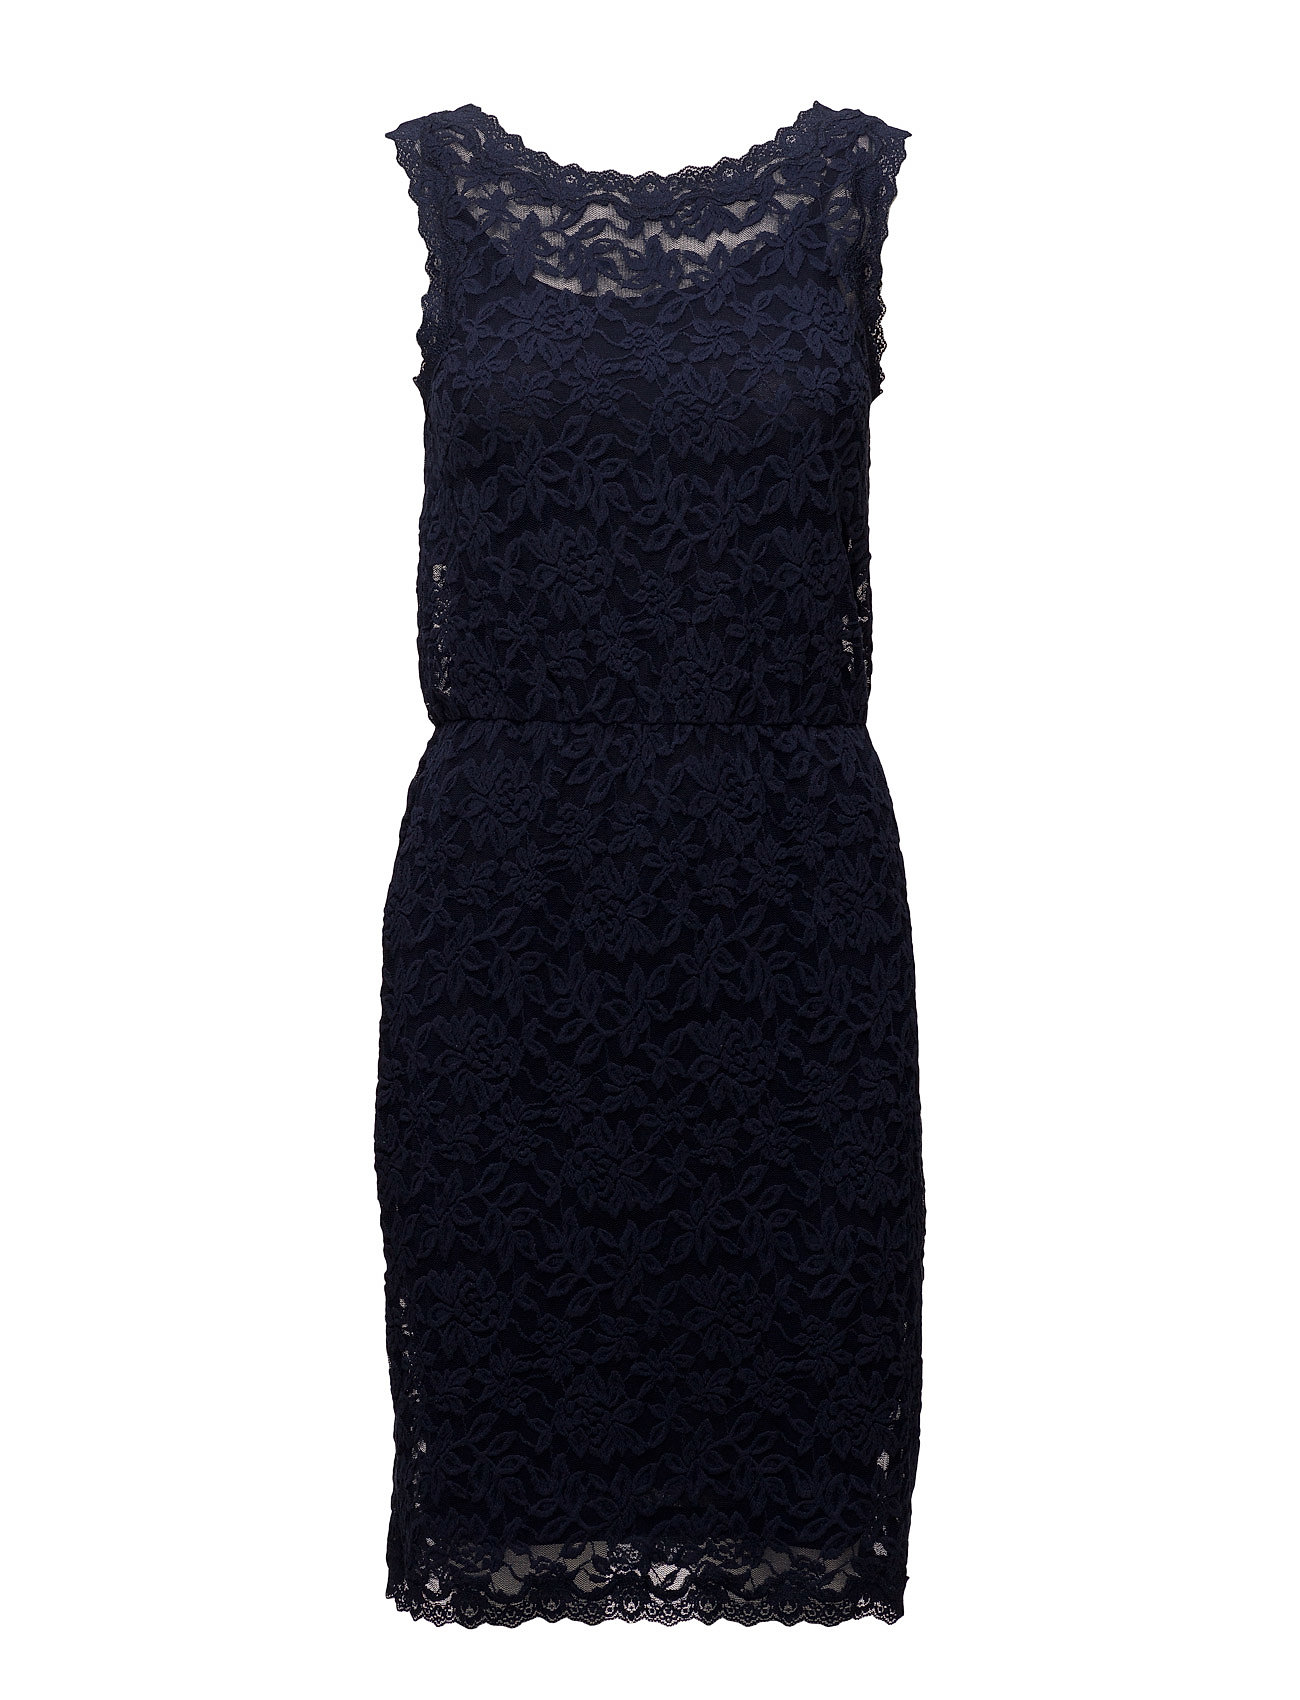 Image of Dress (2959687433)